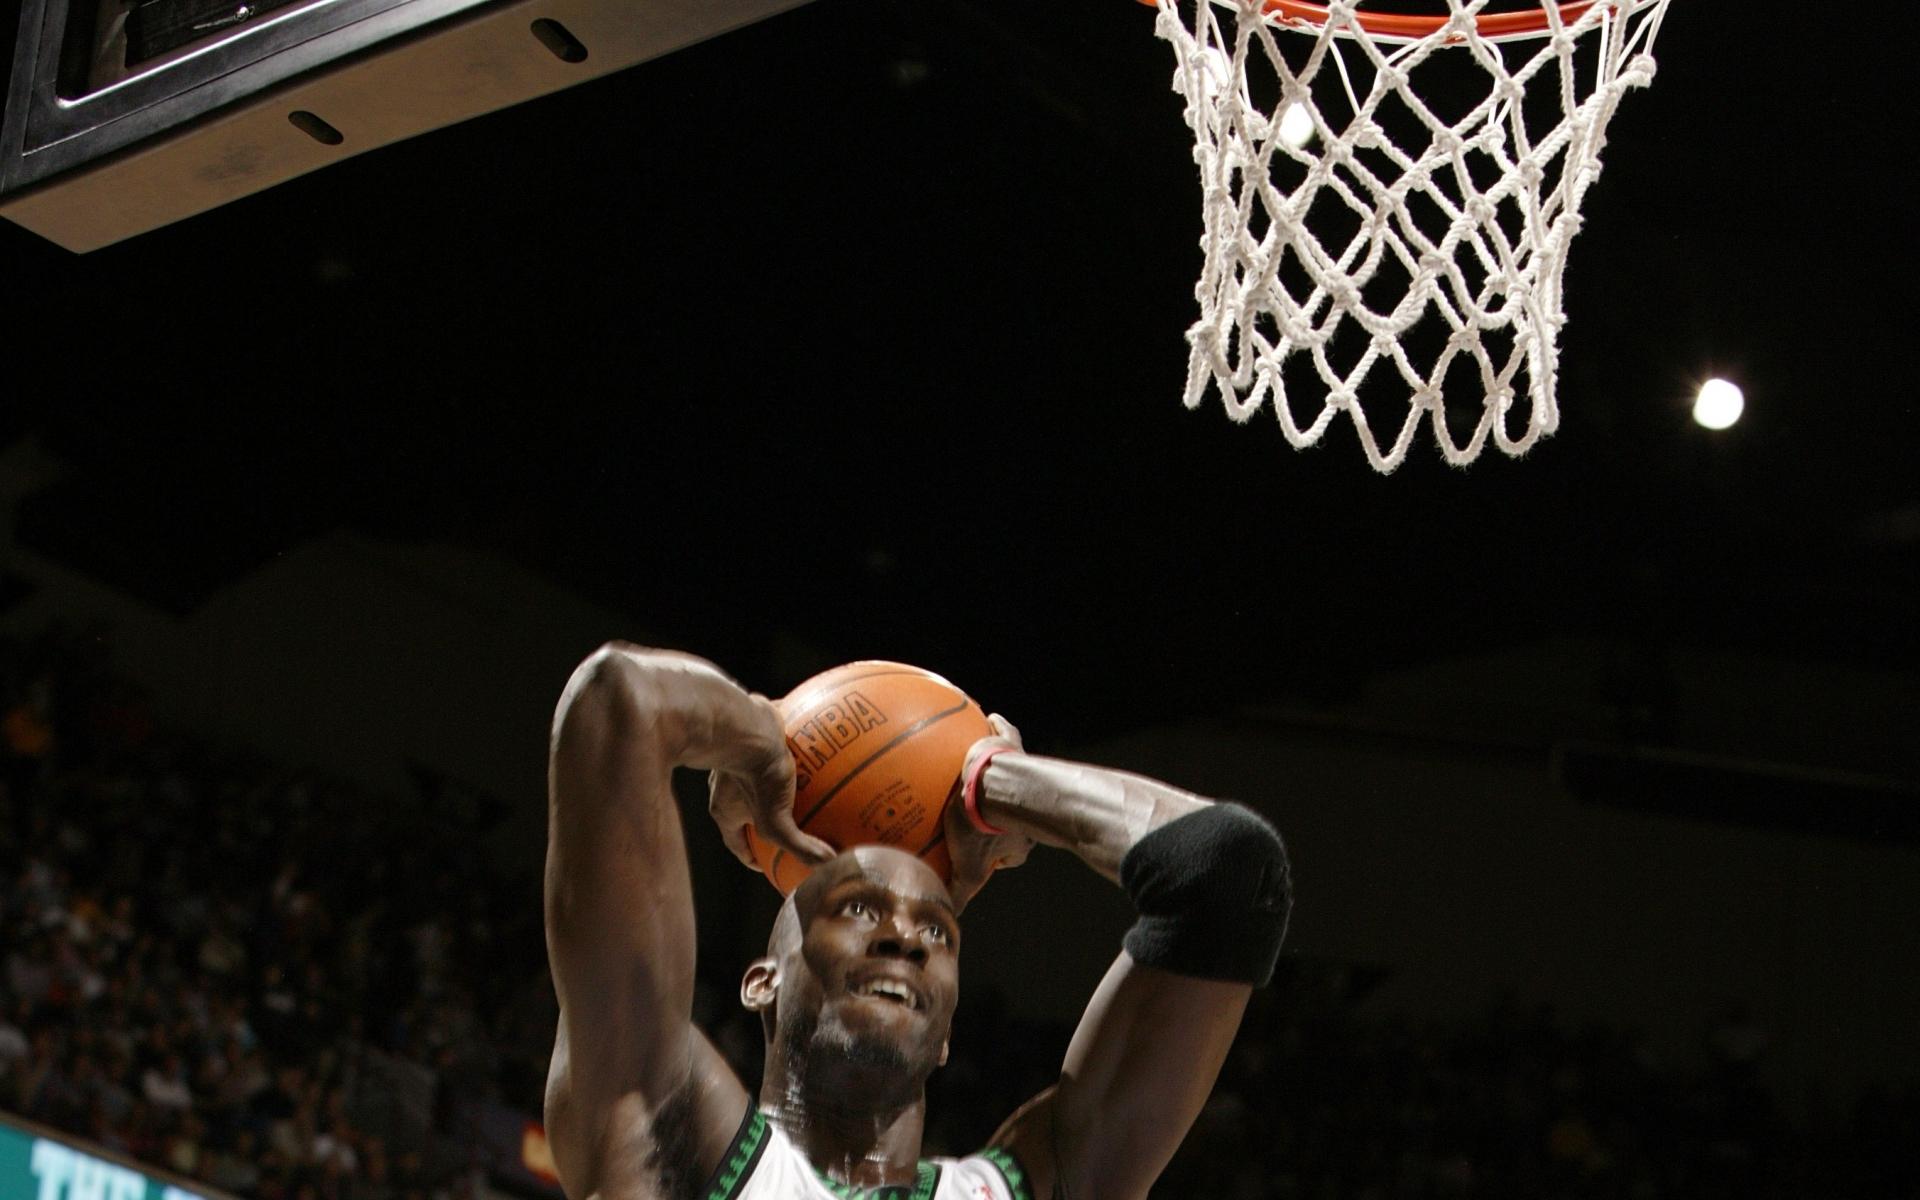 Sports nba basketball kevin garnett minnesota timberwolves 1920x1200